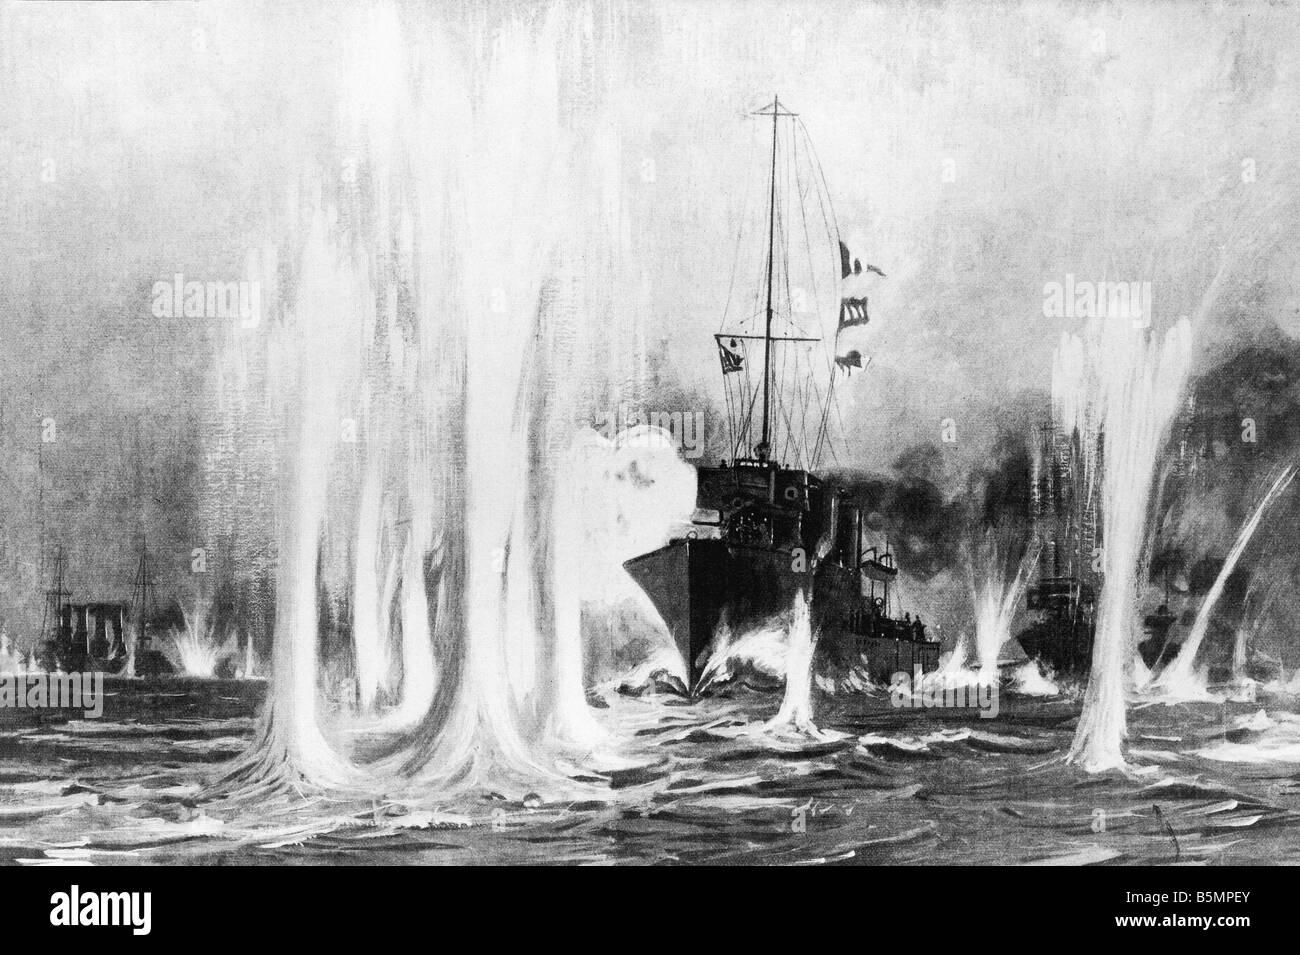 9 1914 8 28 A1 E Naval Battle August 1914 Holz ger 1. Weltkrieg Krieg auf hoher See Naval battle auf Helgoland 28 8 1914 Kampfszene mit Stockfoto